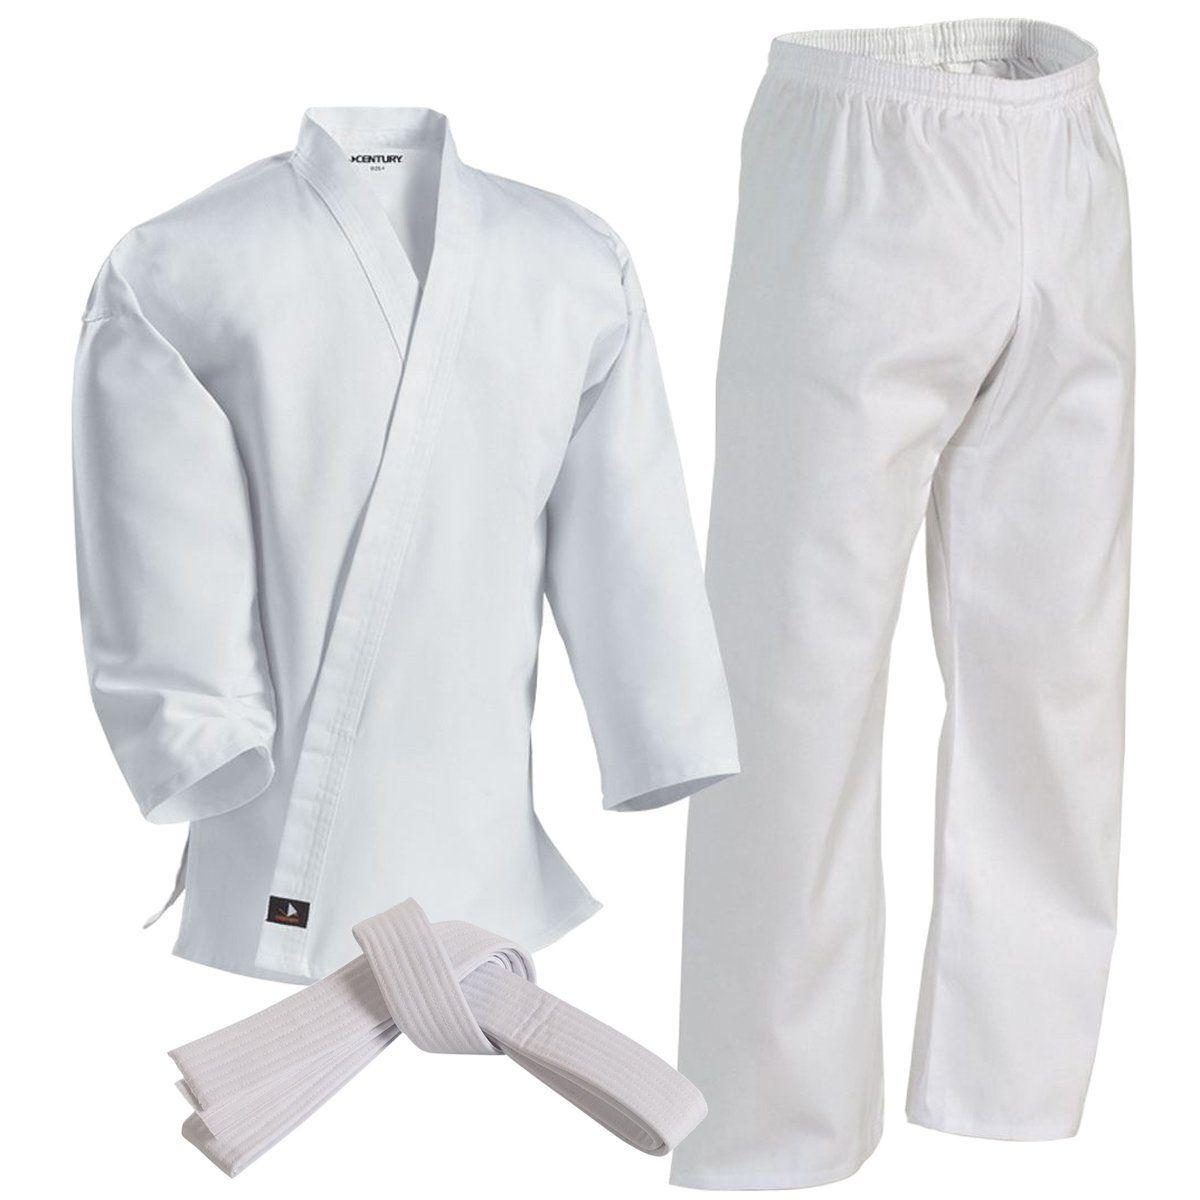 NEW Proforce Lightweight Karate Uniform Gi Pant White Black w// Belt Tae Kwon Do